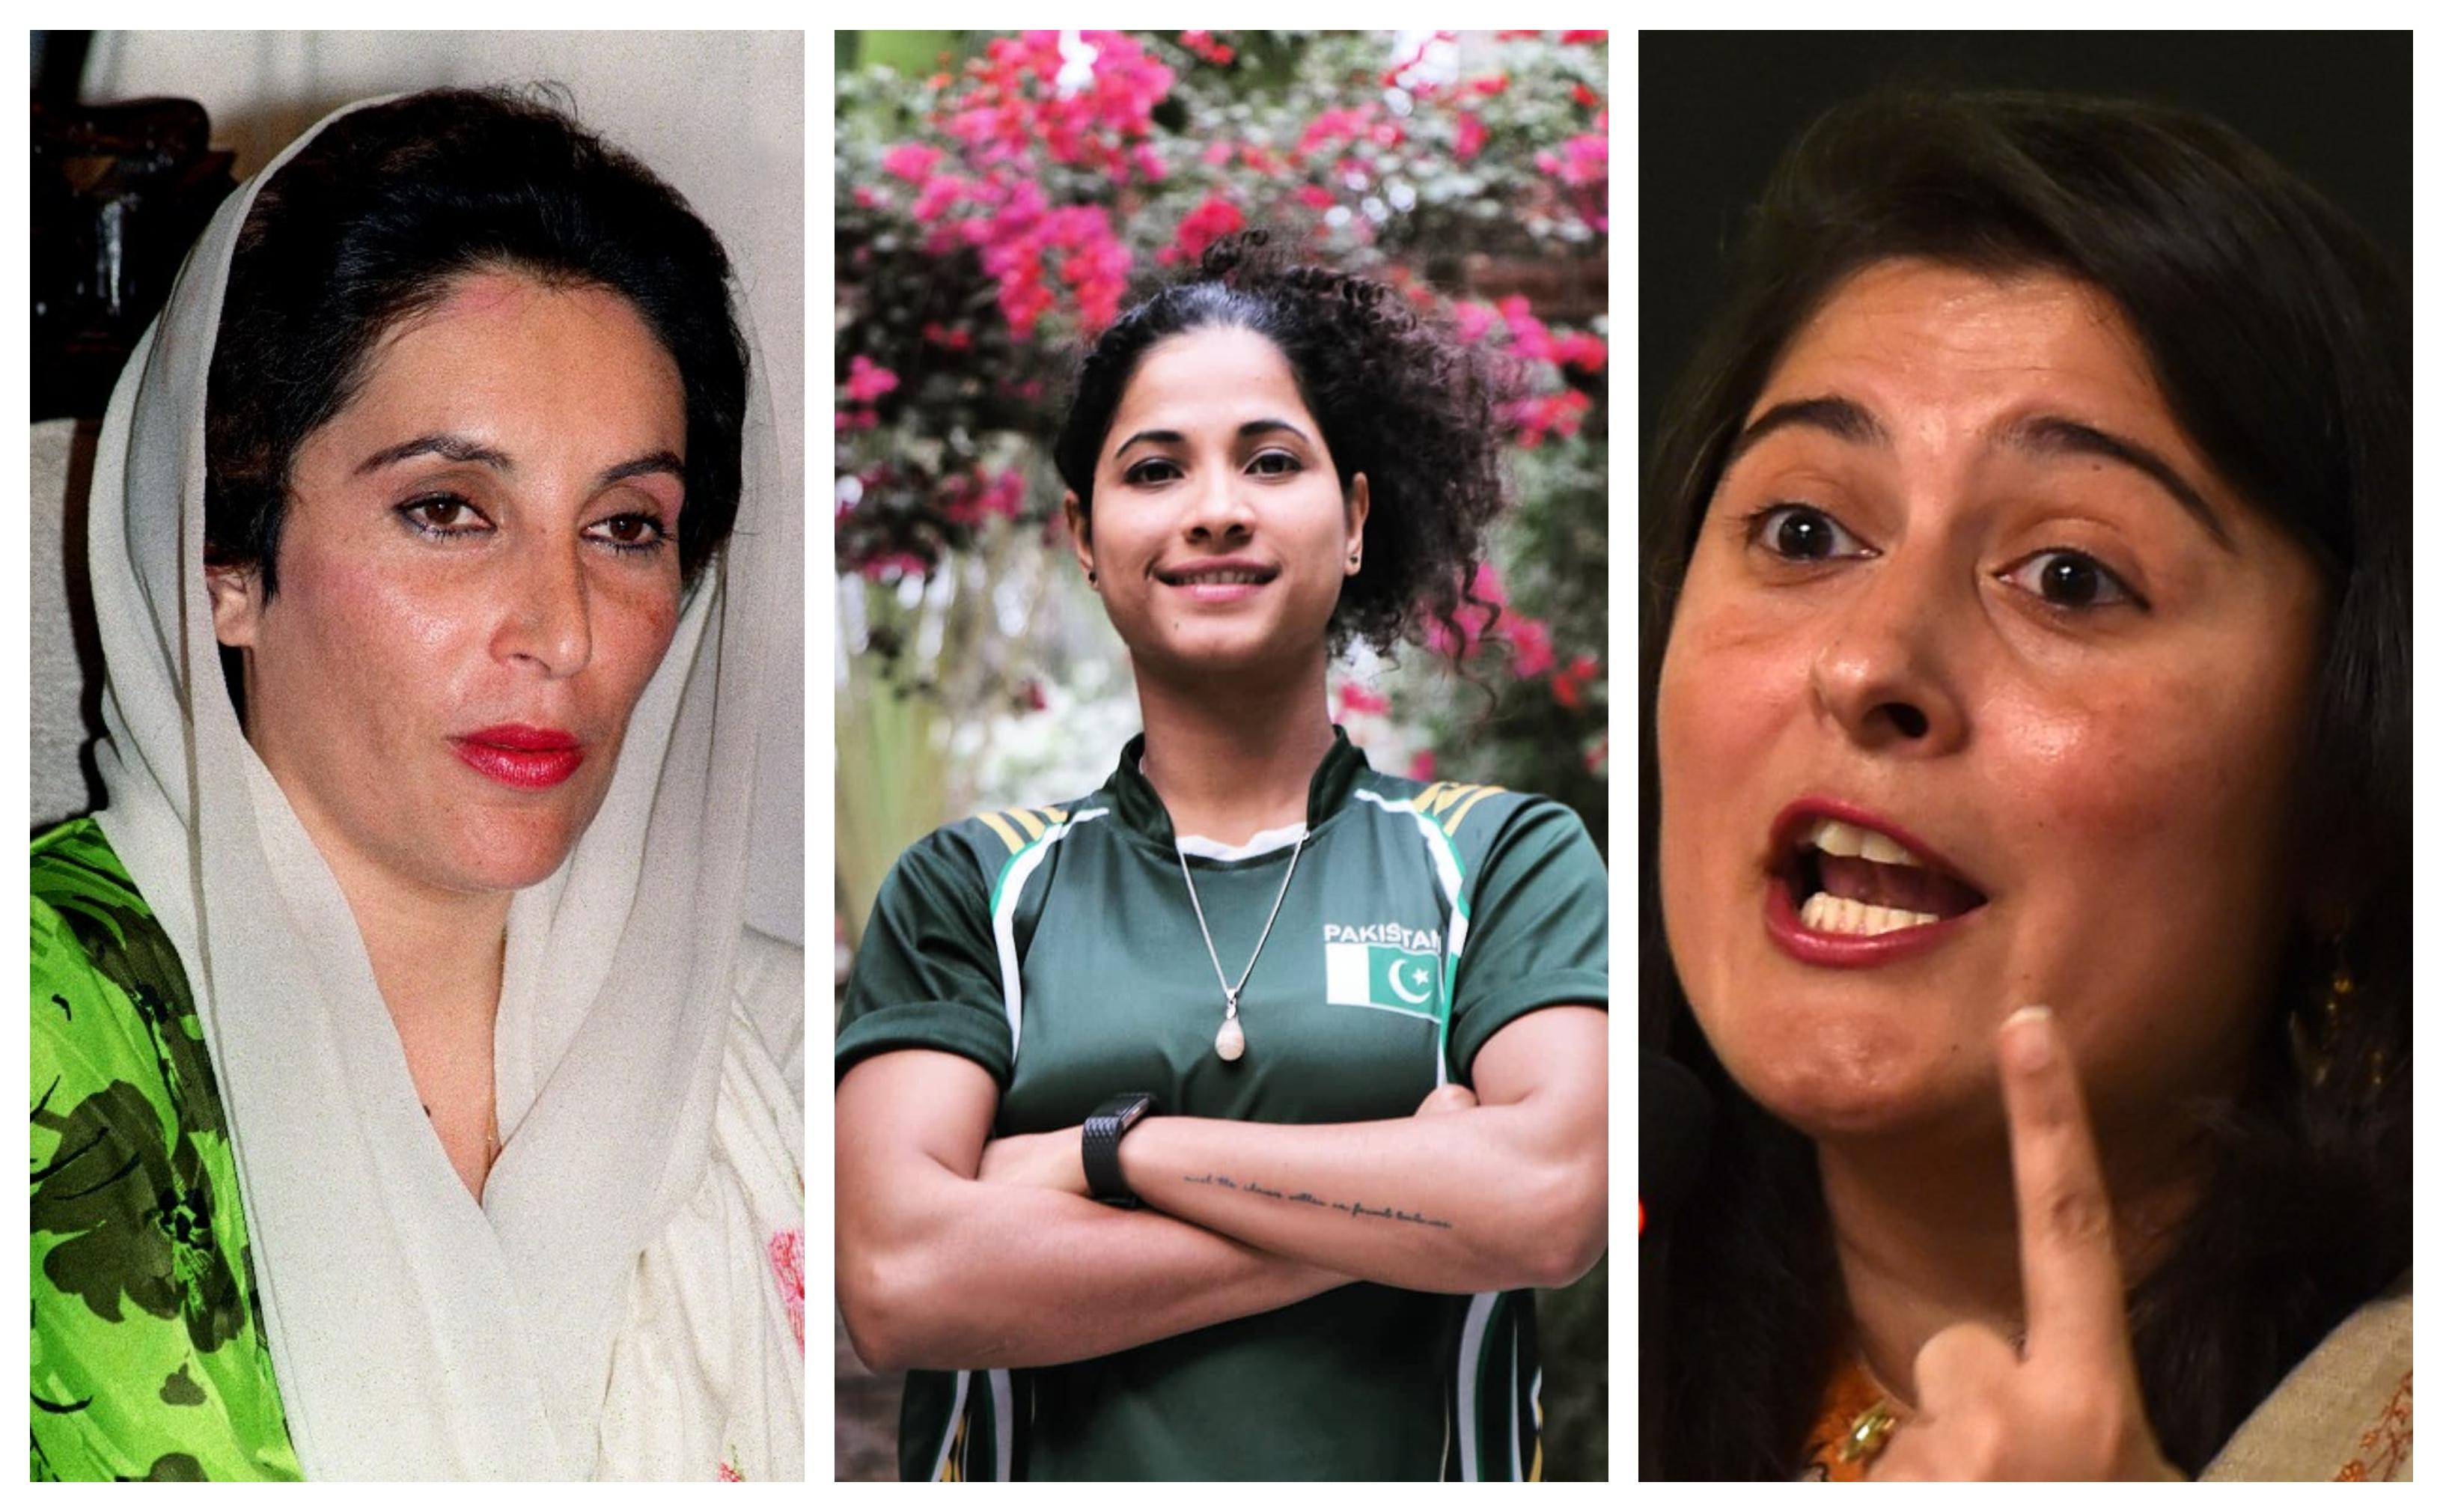 pakistani women quotes